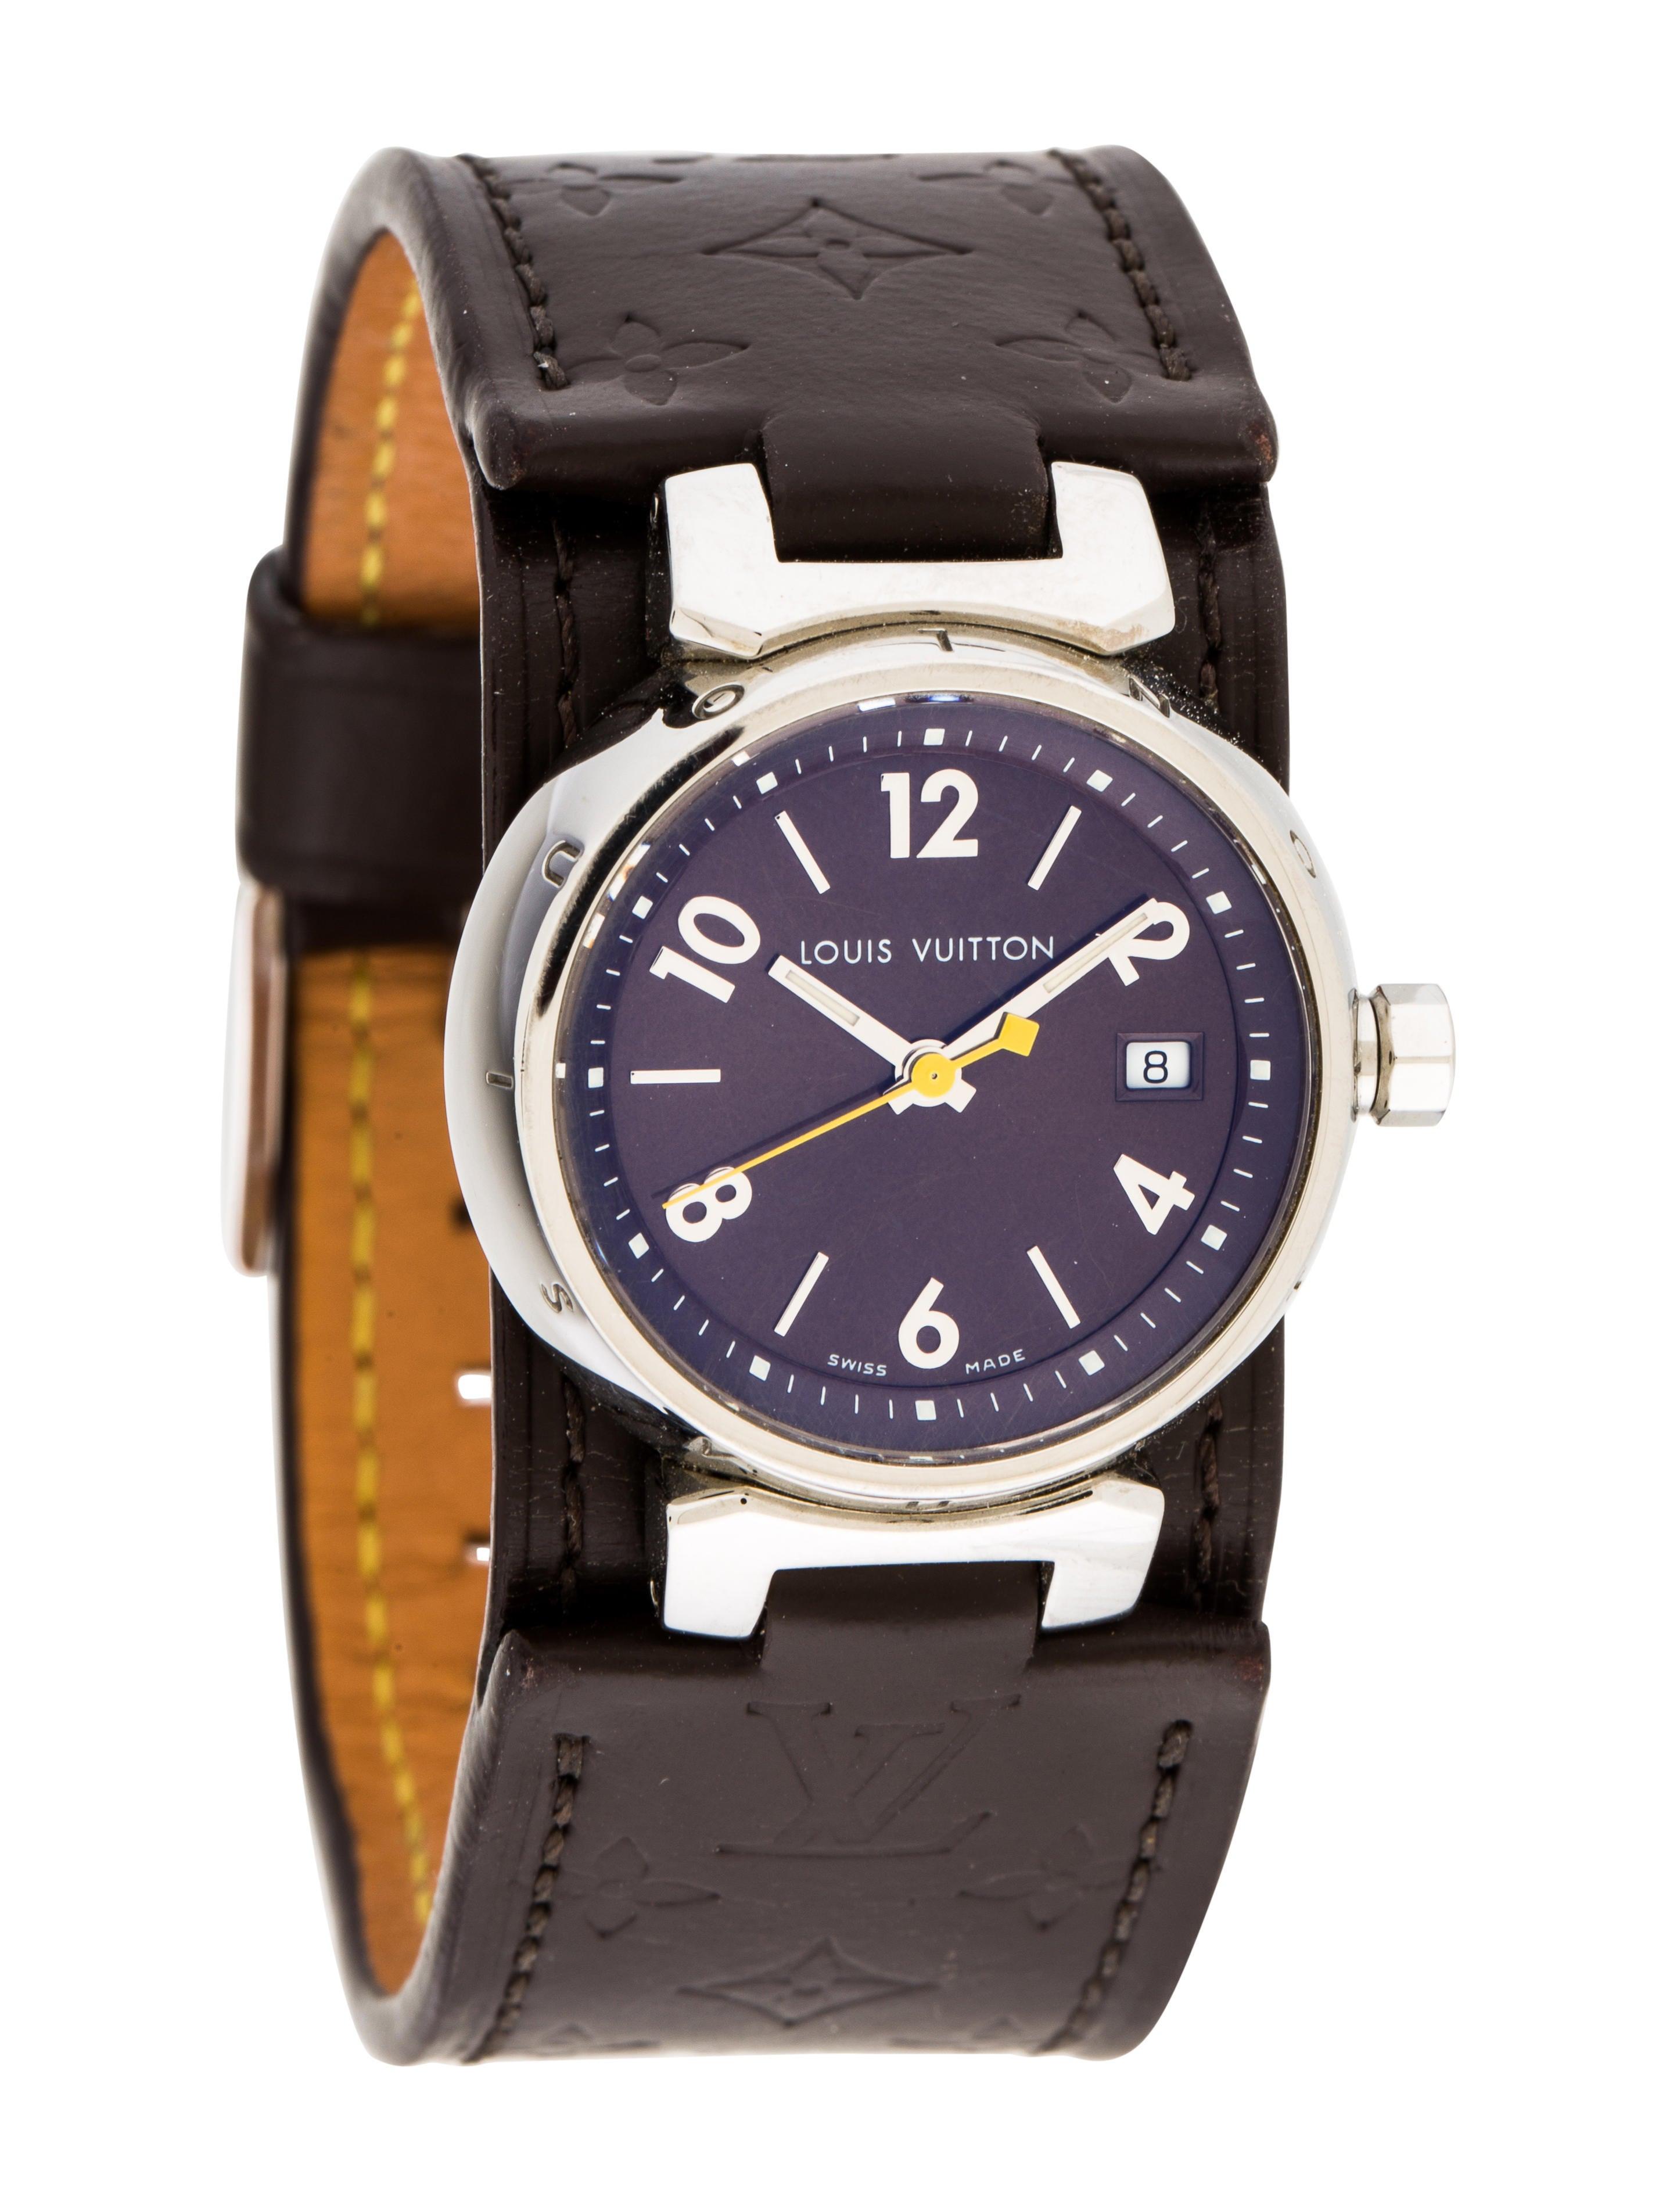 Louis Vuitton Tambour Watch - Strap